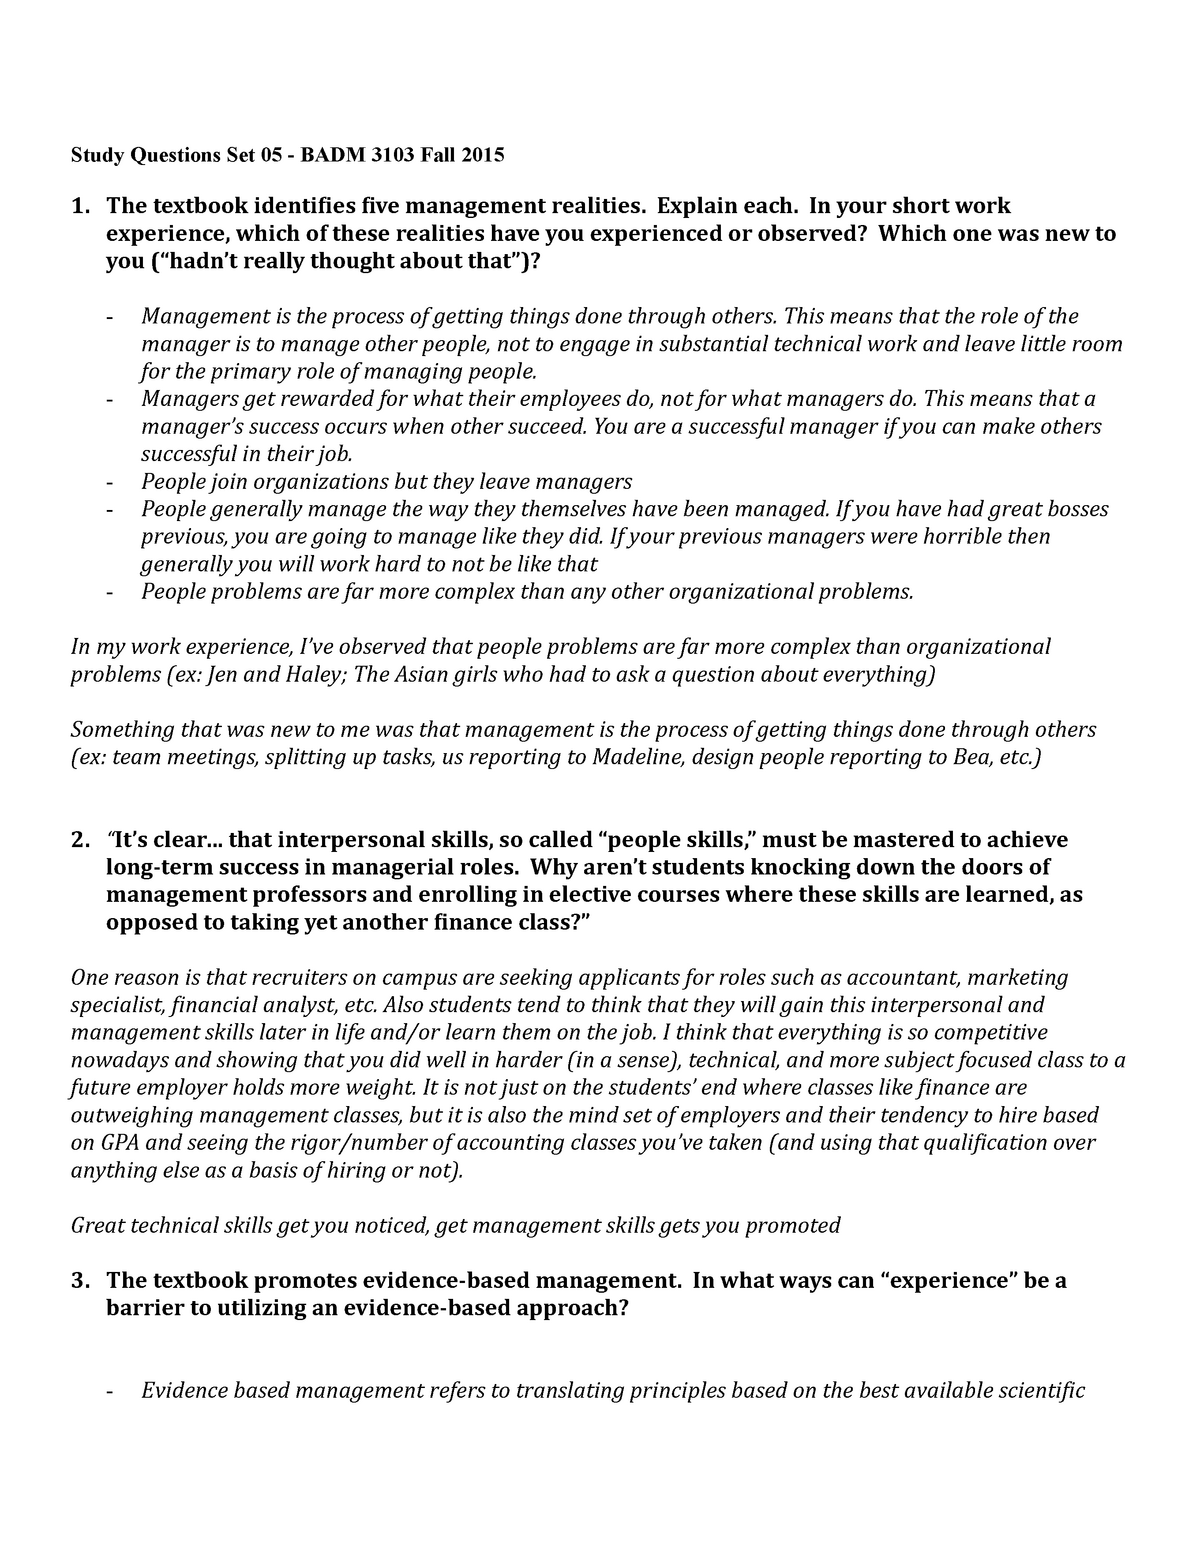 Study questions 5 - One of many mandatory lengthy homework